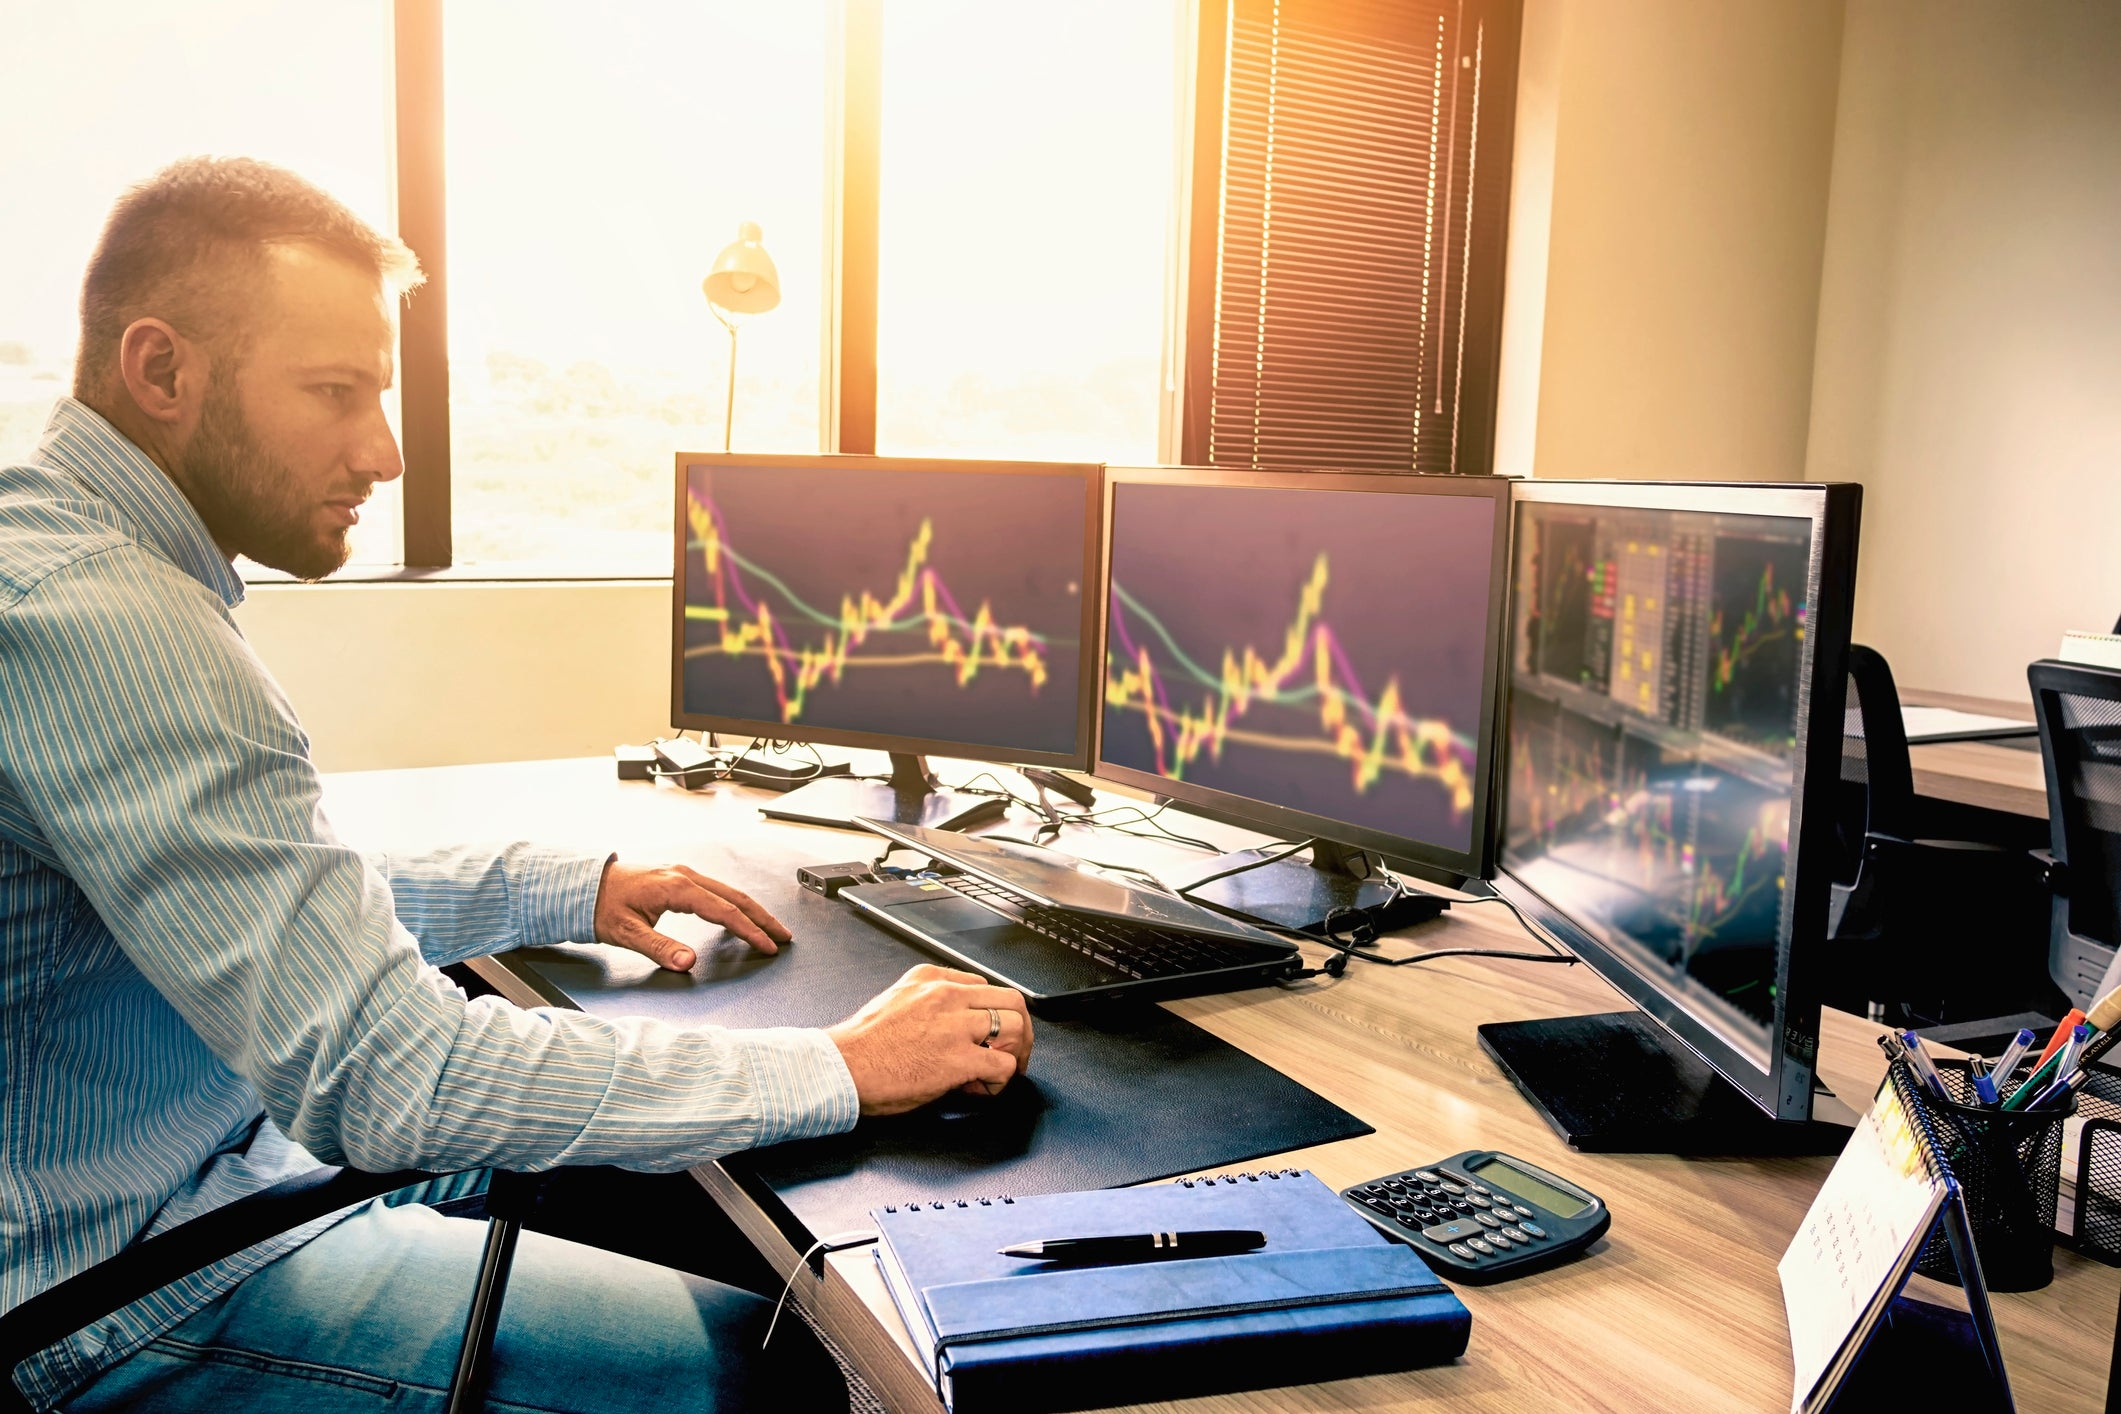 Dow Jones Breaks 35,100 With Apple, Visa, Microsoft Earnings Coming Jason Hall   Jul 26, 2021